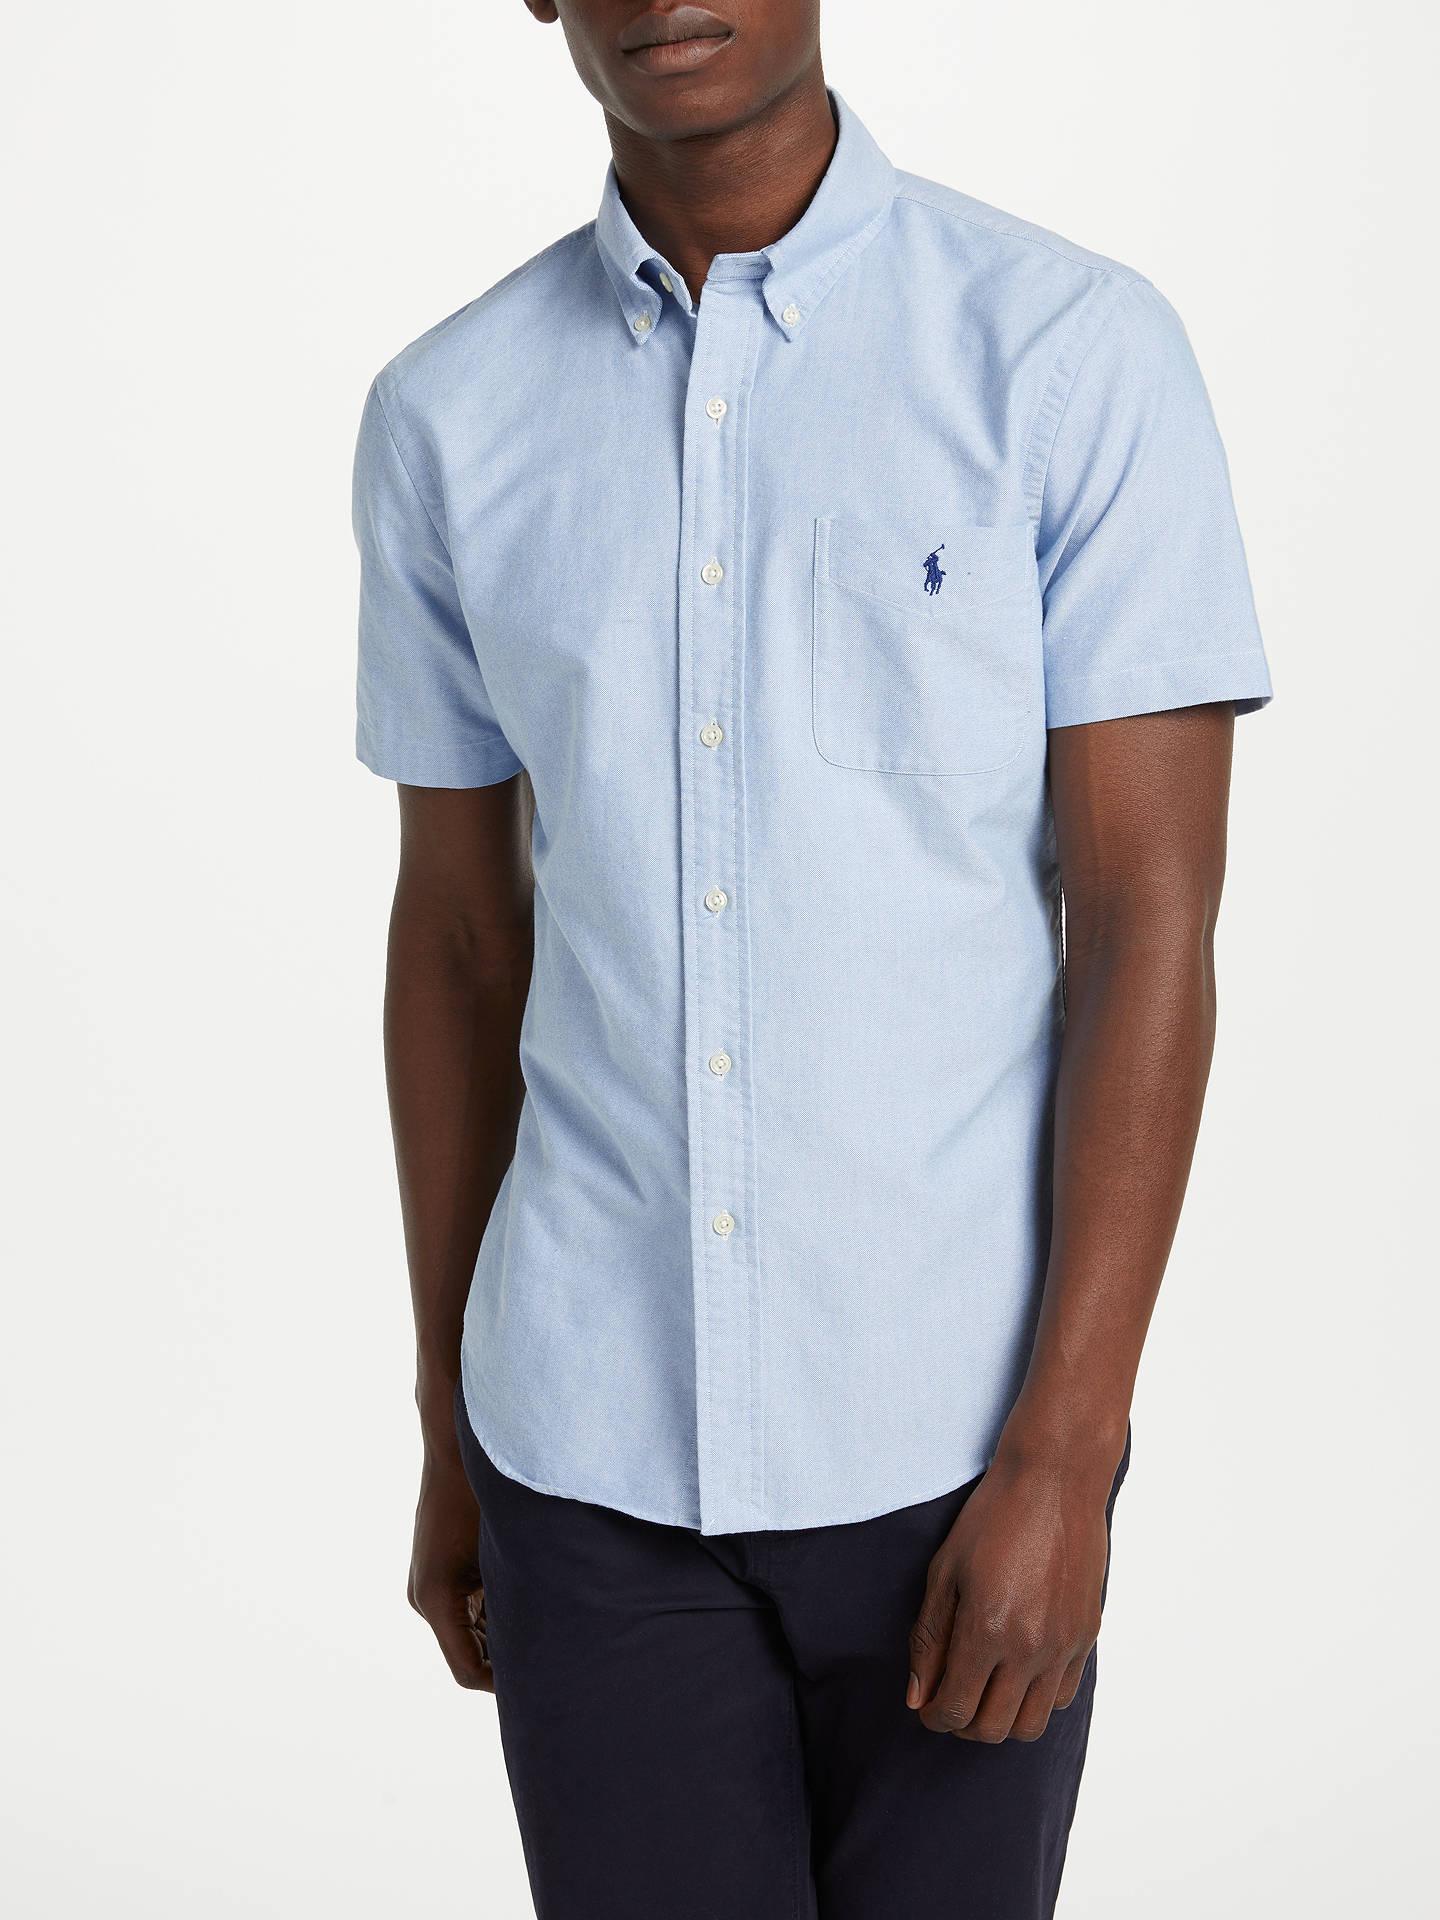 4b802af8f2438 Polo Ralph Lauren Short Sleeve Slim Oxford Shirt at John Lewis ...